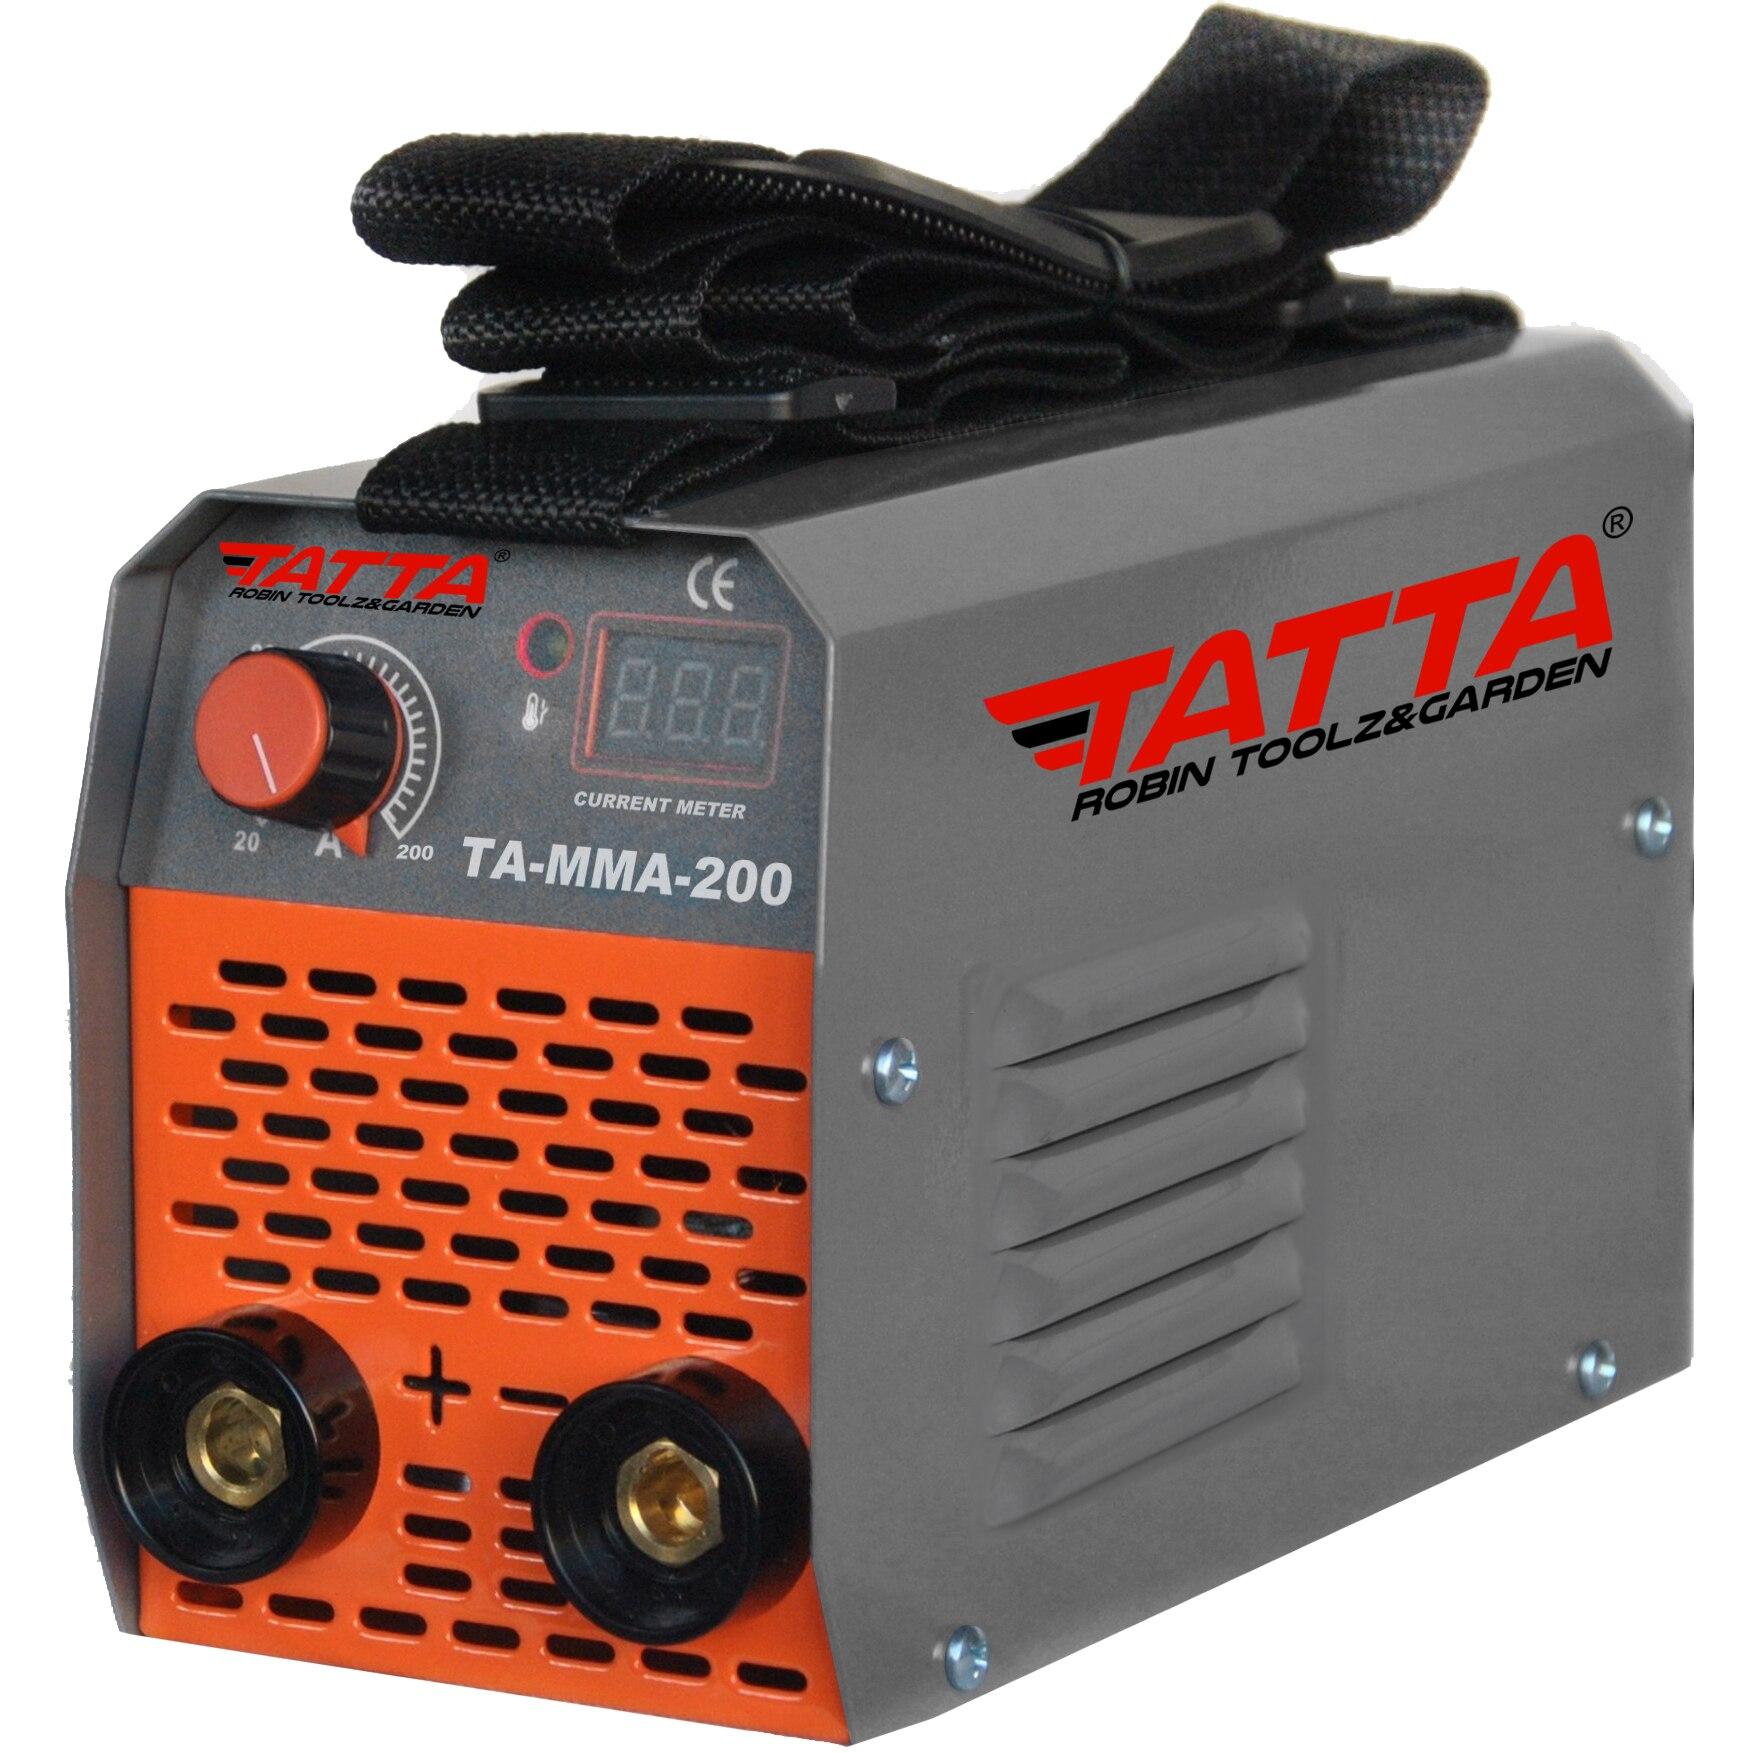 Fotografie Aparat de sudura Tatta TA-MMA-200, putere absorbita 7.1 kVA, eficienta85%, electrod 1.6-3.2 mm